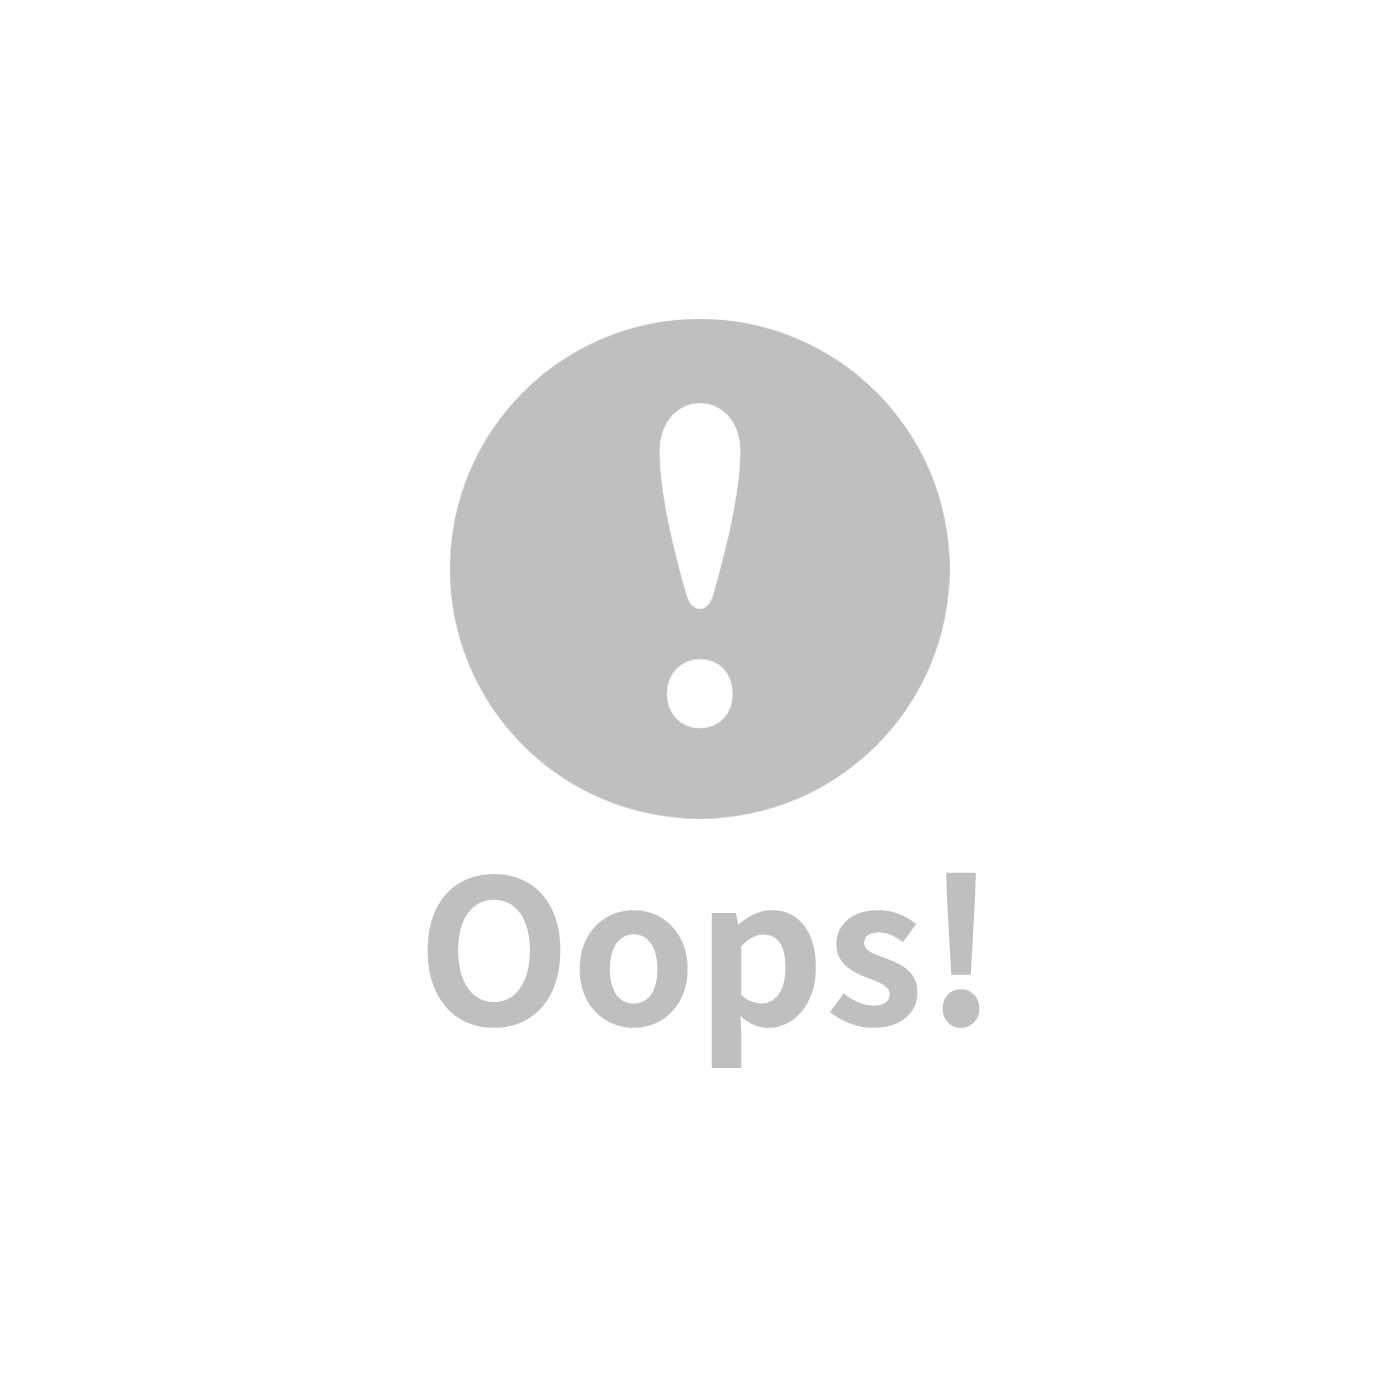 La Millou Jersey時尚篷篷浴巾_標準0-2Y- 微笑彩魟魚(夢幻珊瑚粉)